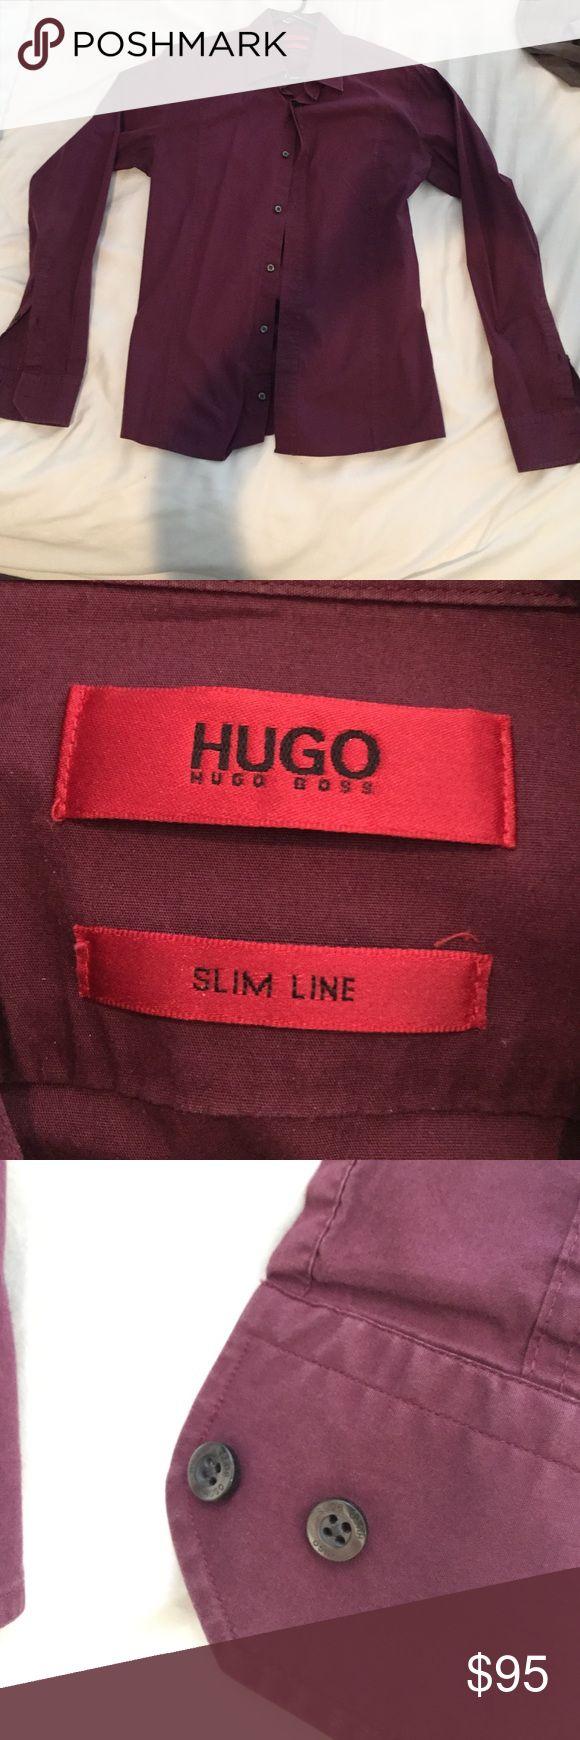 Button up dress shirt Men's button up slim fit dress shirt Hugo Boss Shirts Dress Shirts